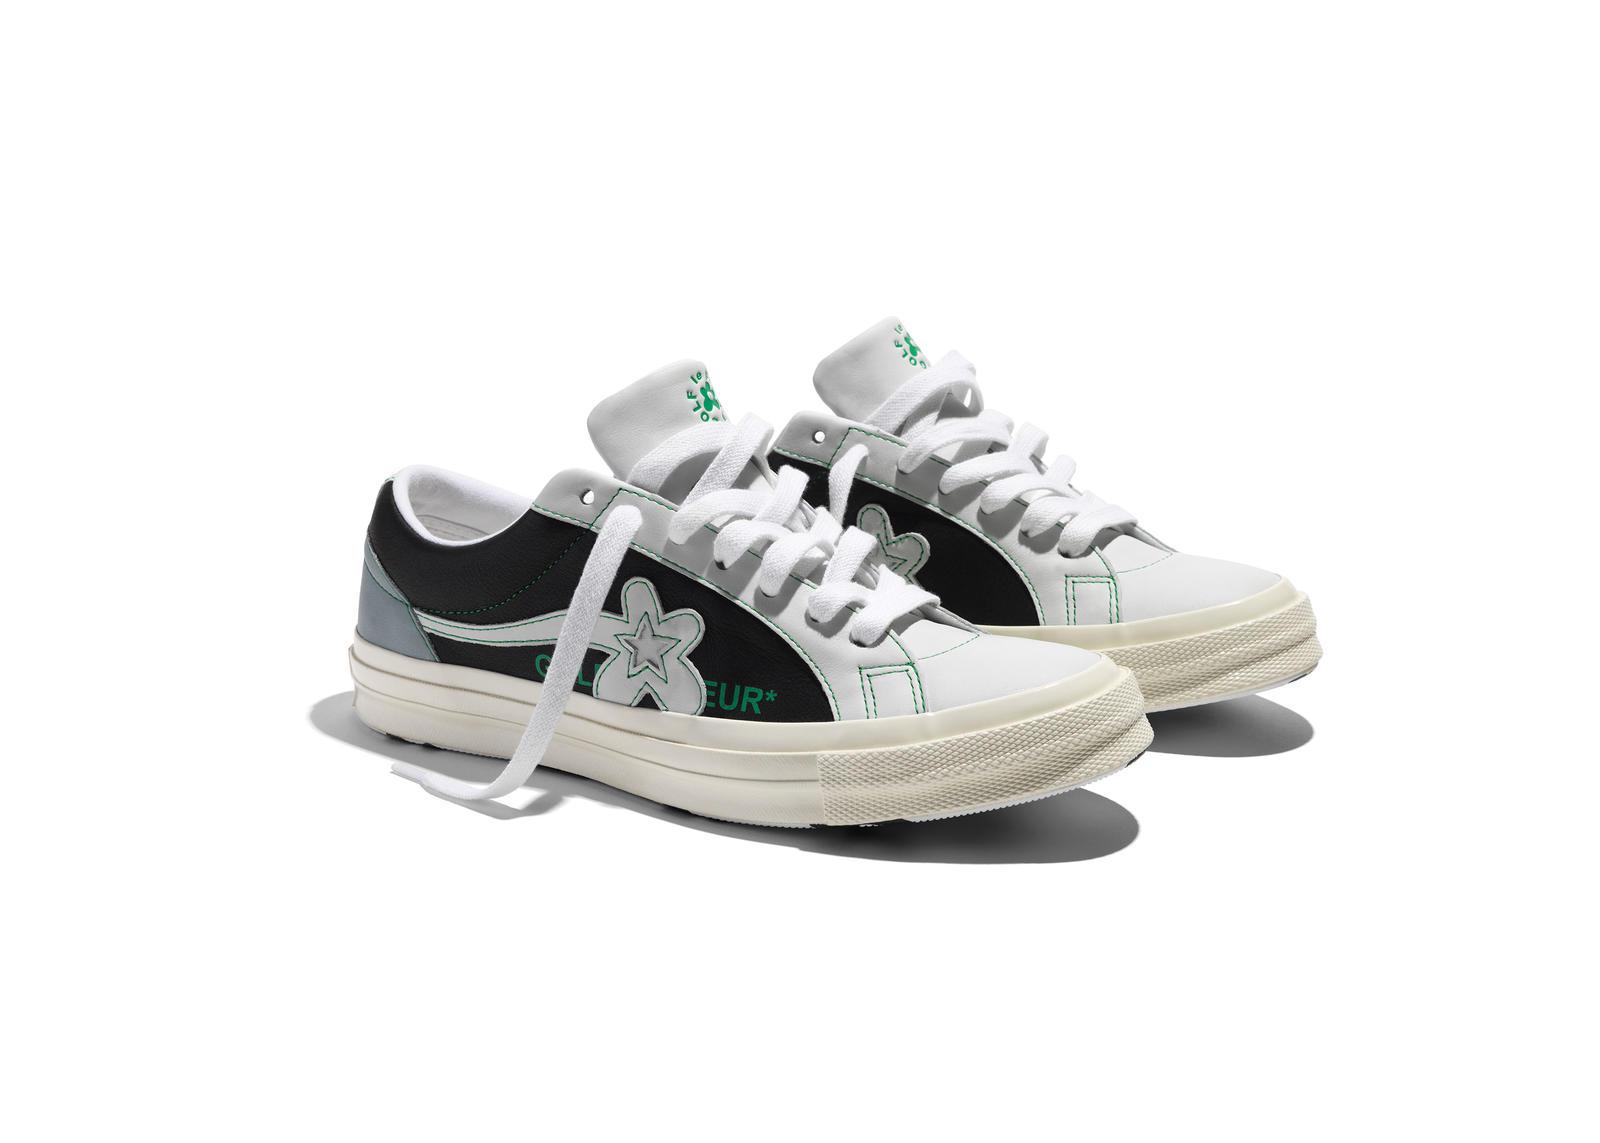 1b69f20fd20242 Converse x GOLF le FLEUR  Goes Two-Tone - Nike News